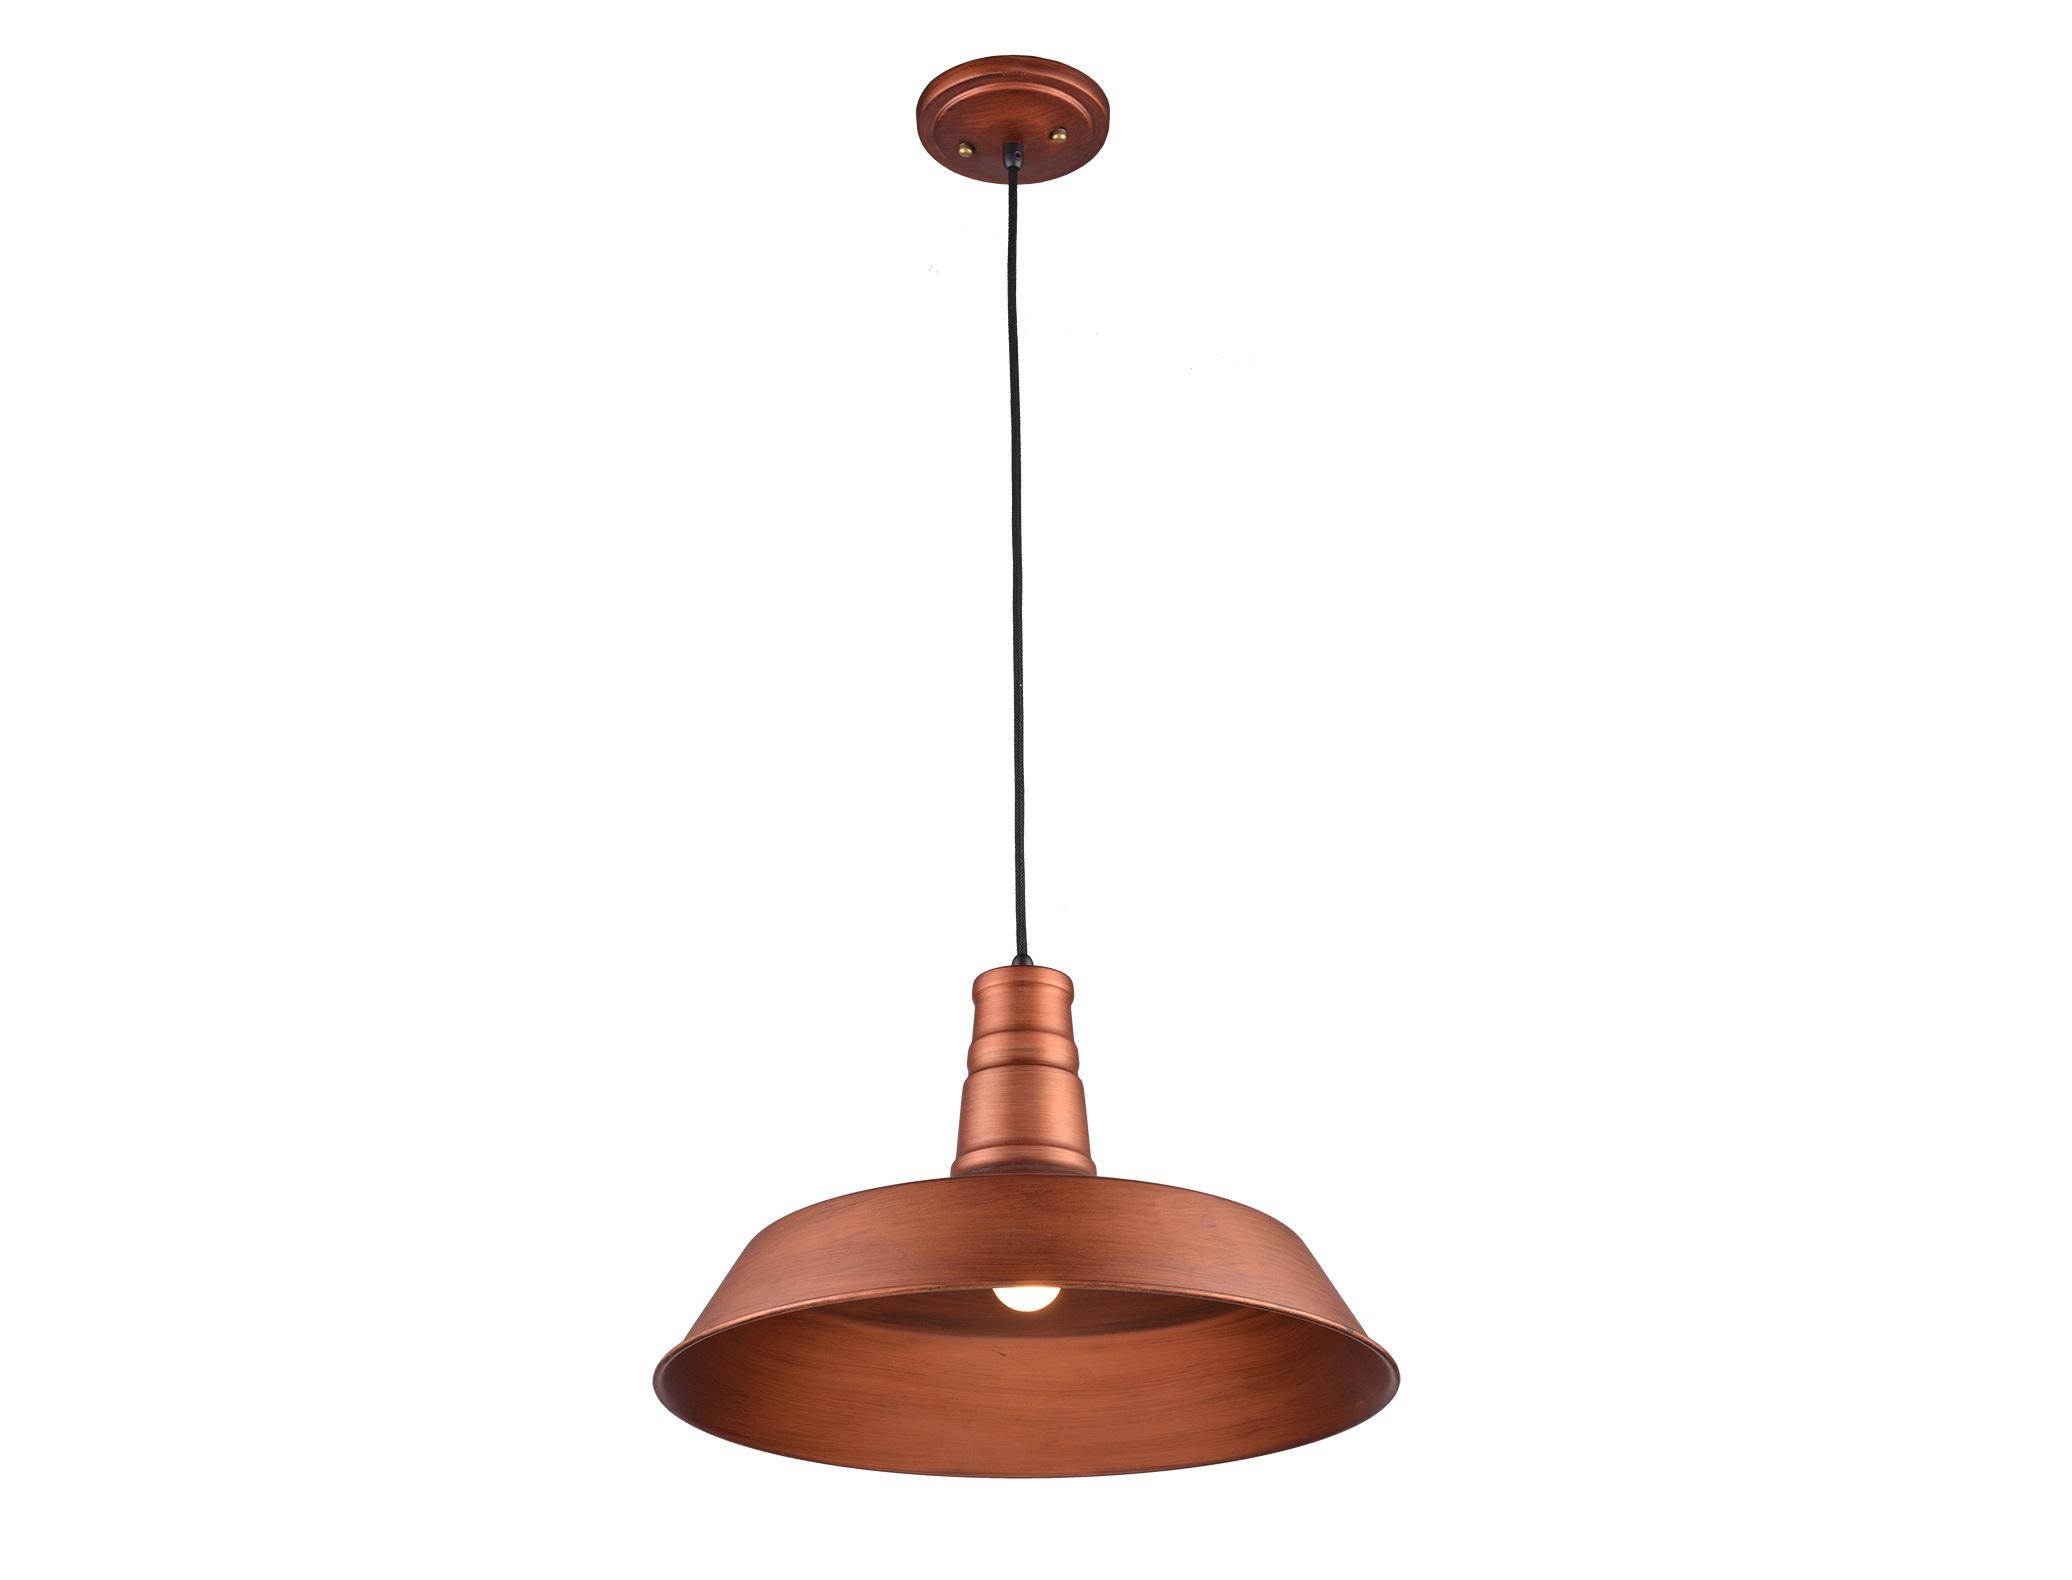 Подвесной светильникПодвесные светильники<br>&amp;lt;div&amp;gt;&amp;lt;div&amp;gt;Вид цоколя: E27&amp;lt;/div&amp;gt;&amp;lt;div&amp;gt;Мощность: 60W&amp;lt;/div&amp;gt;&amp;lt;div&amp;gt;Количество ламп: 1&amp;lt;/div&amp;gt;&amp;lt;div&amp;gt;Наличие ламп: отсутствуют.&amp;lt;/div&amp;gt;&amp;lt;/div&amp;gt;<br><br>Material: Металл<br>Width см: None<br>Height см: 120<br>Diameter см: 45